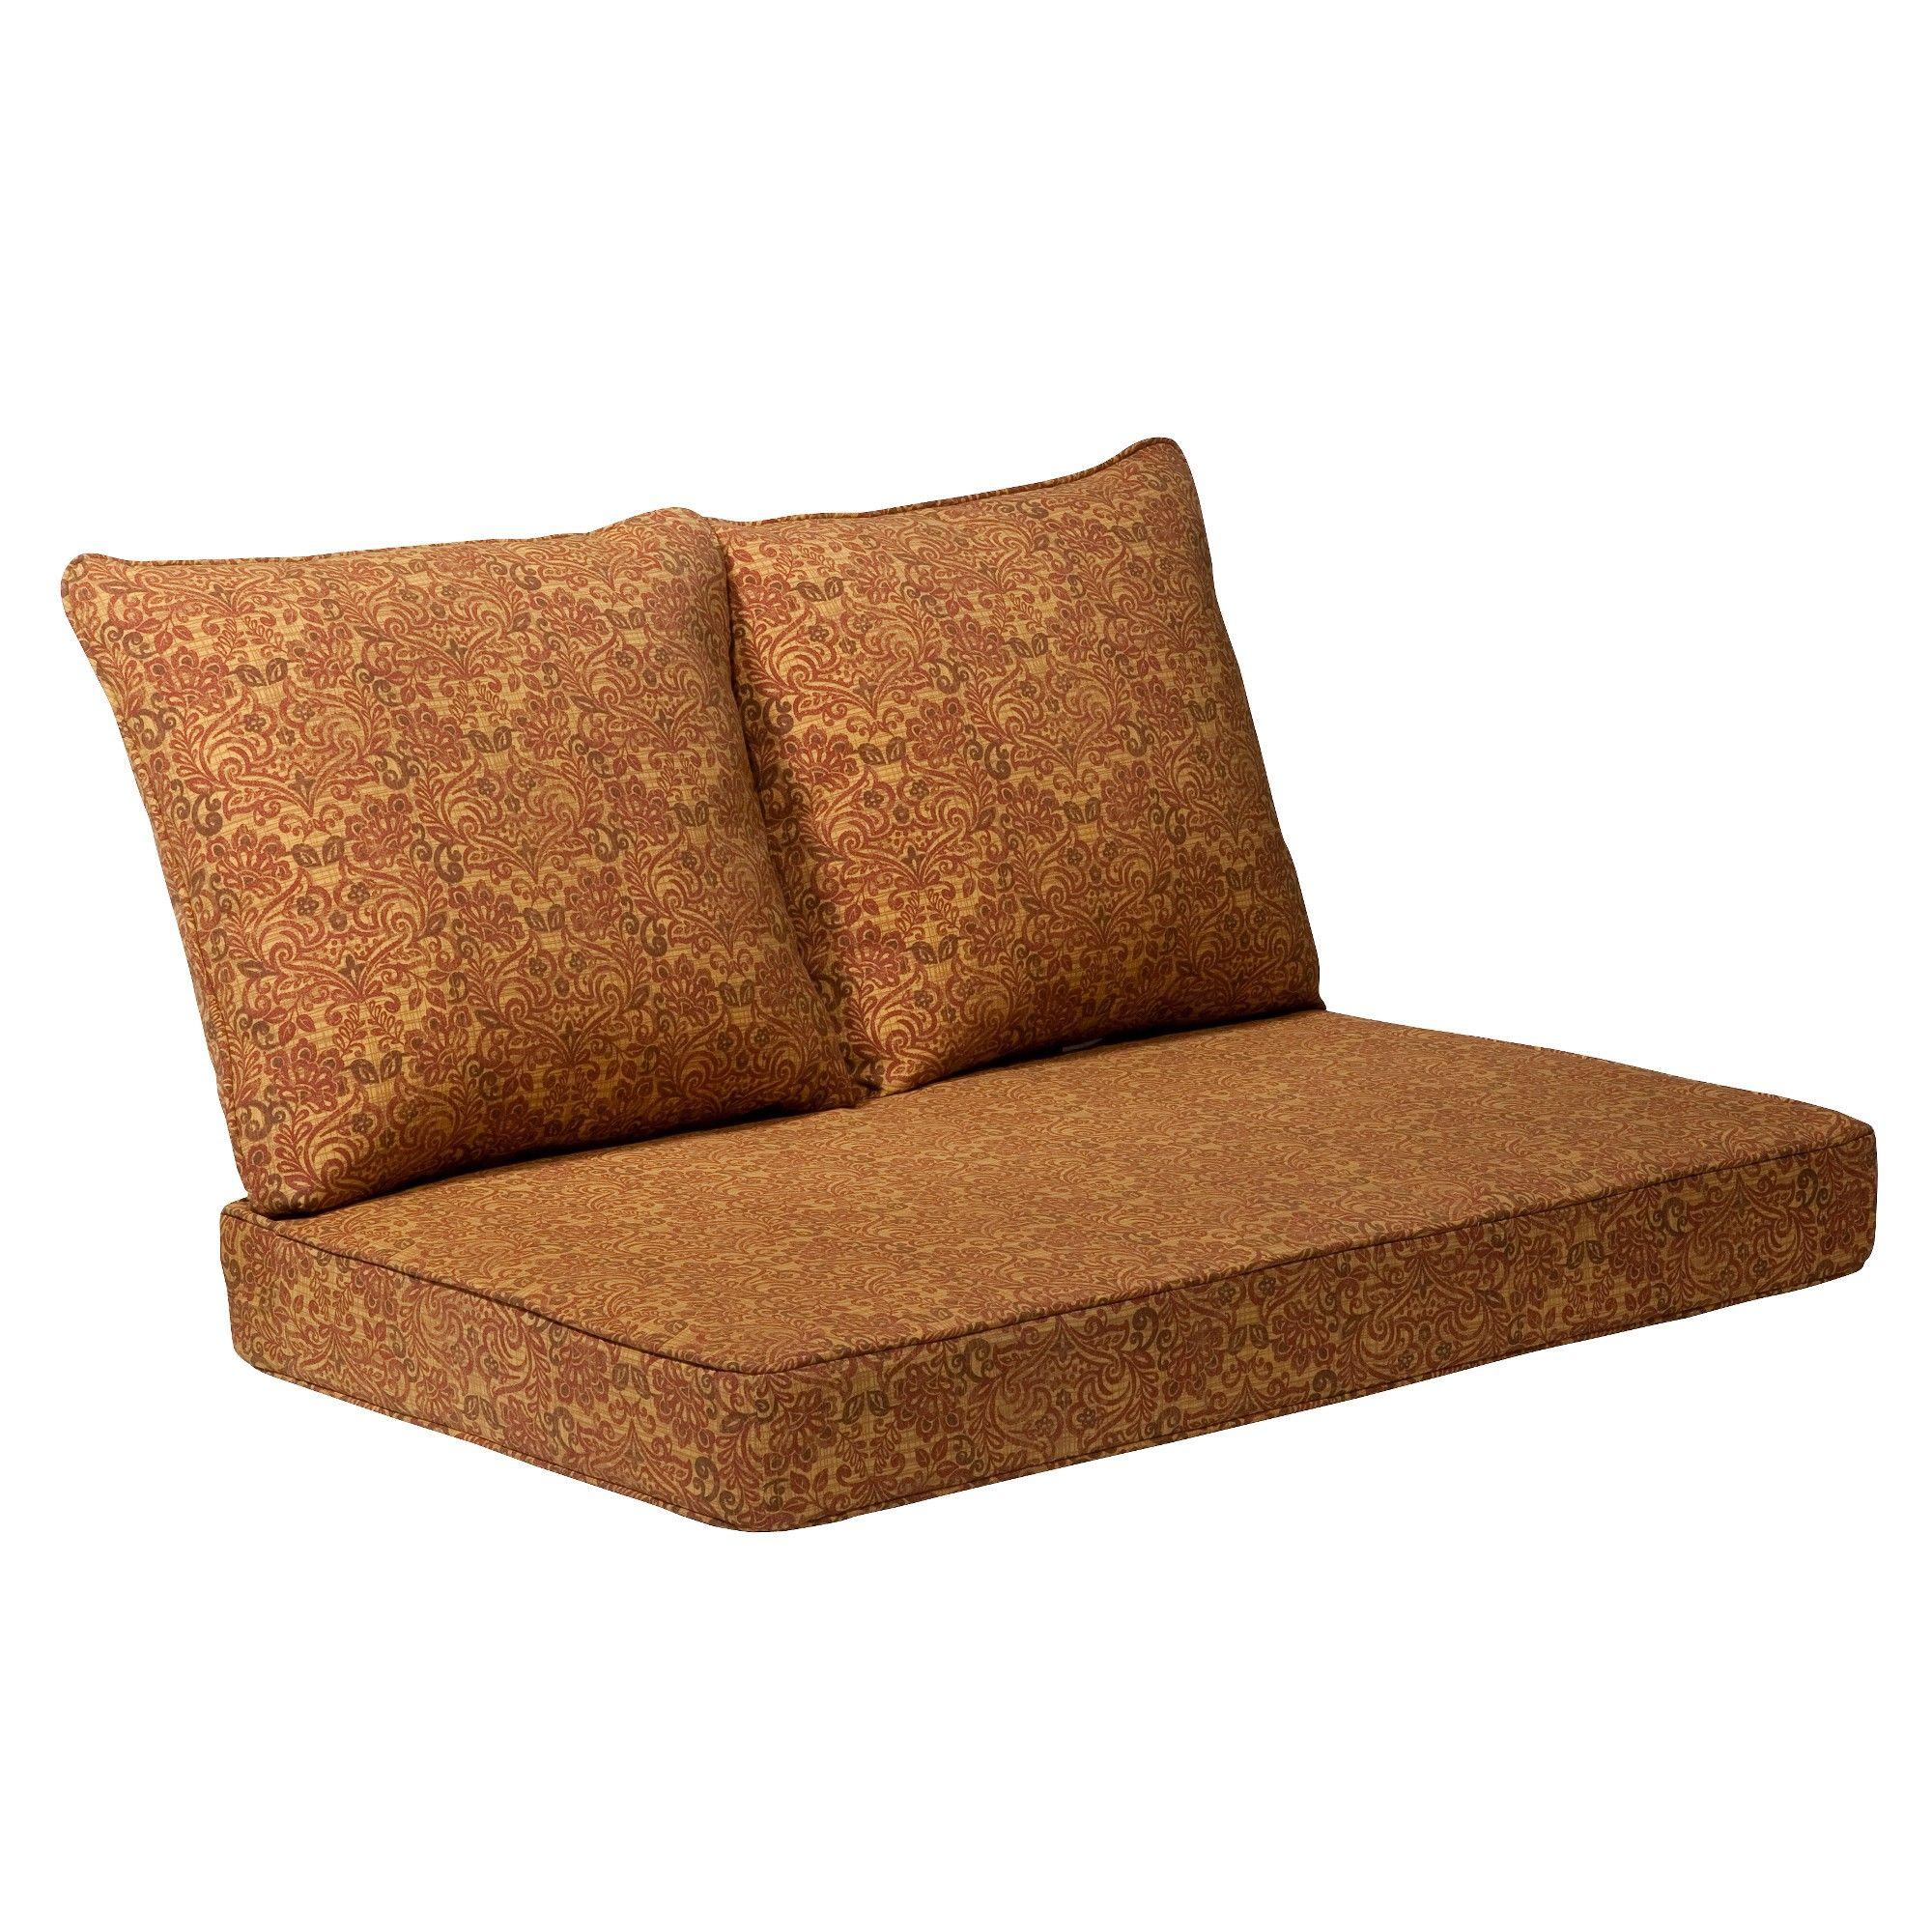 cushions on sofa outdoor loveseat